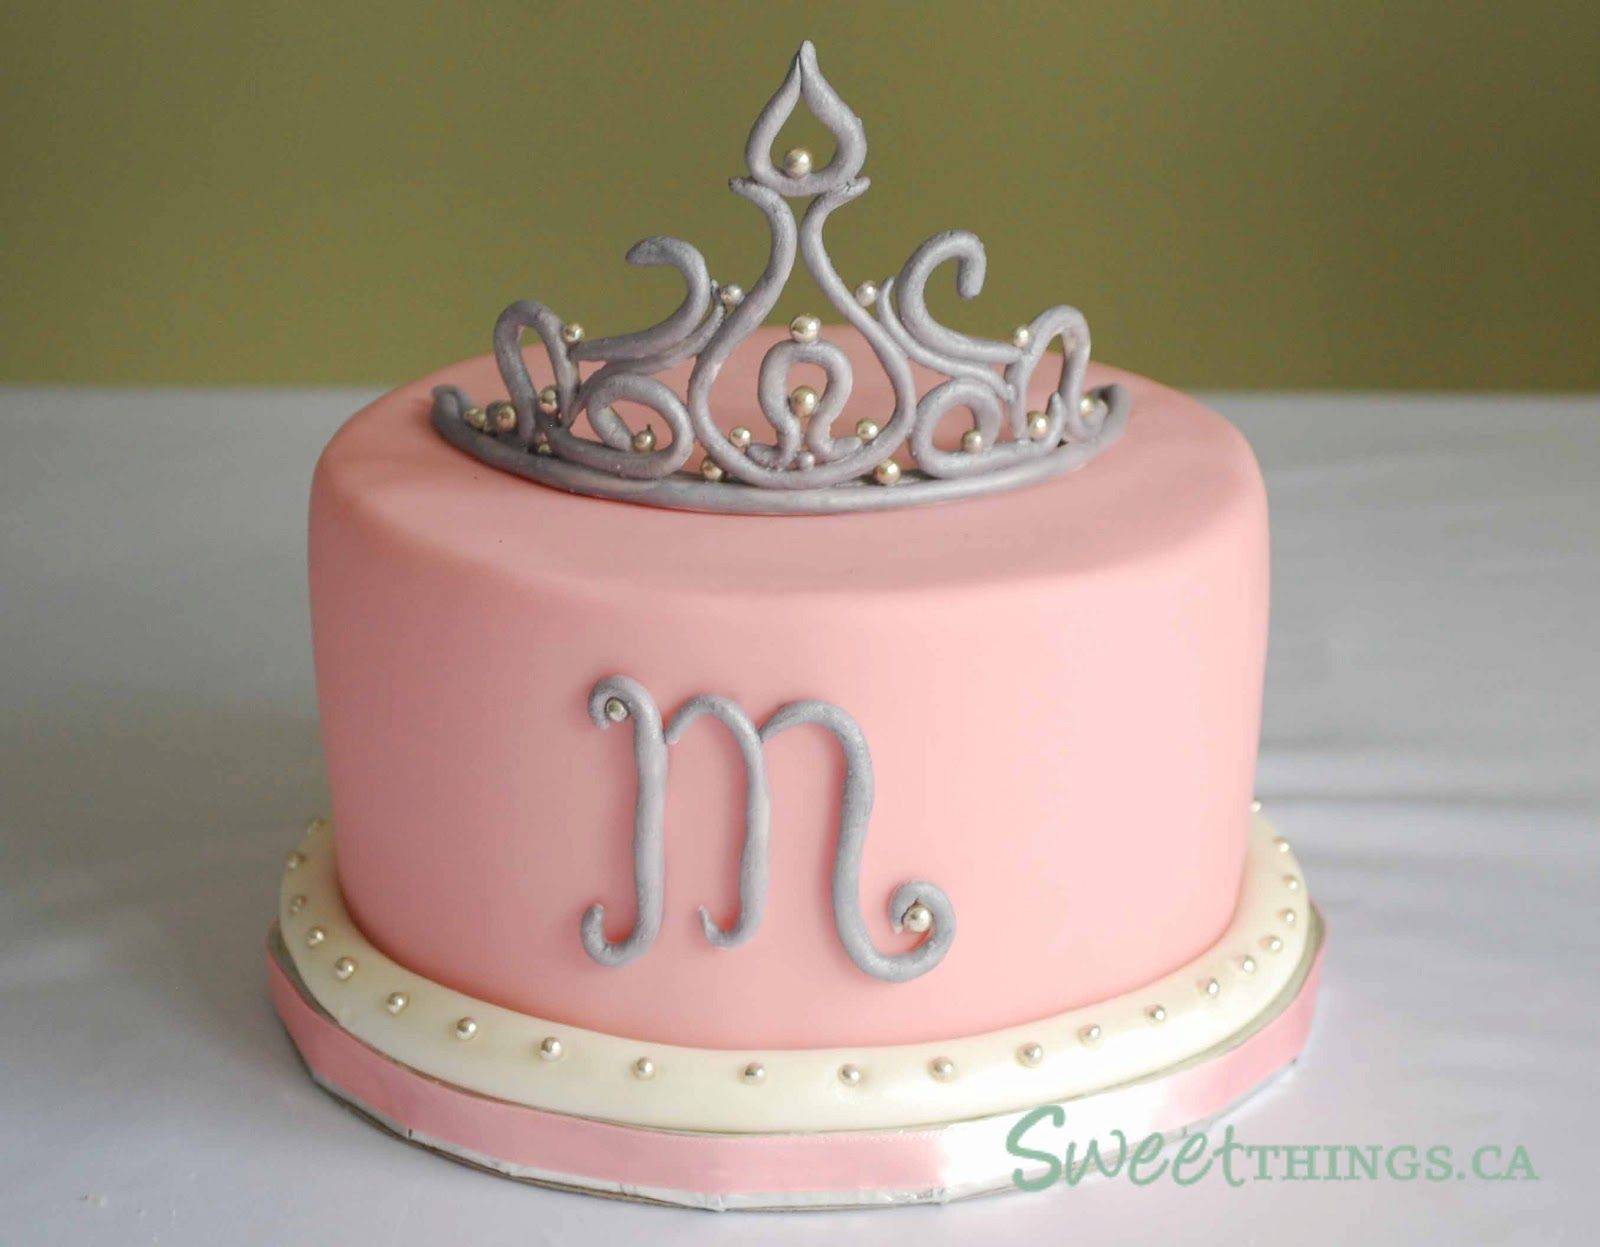 Tiara Cake Sweetthings 8th Birthday Tiara Cake Party